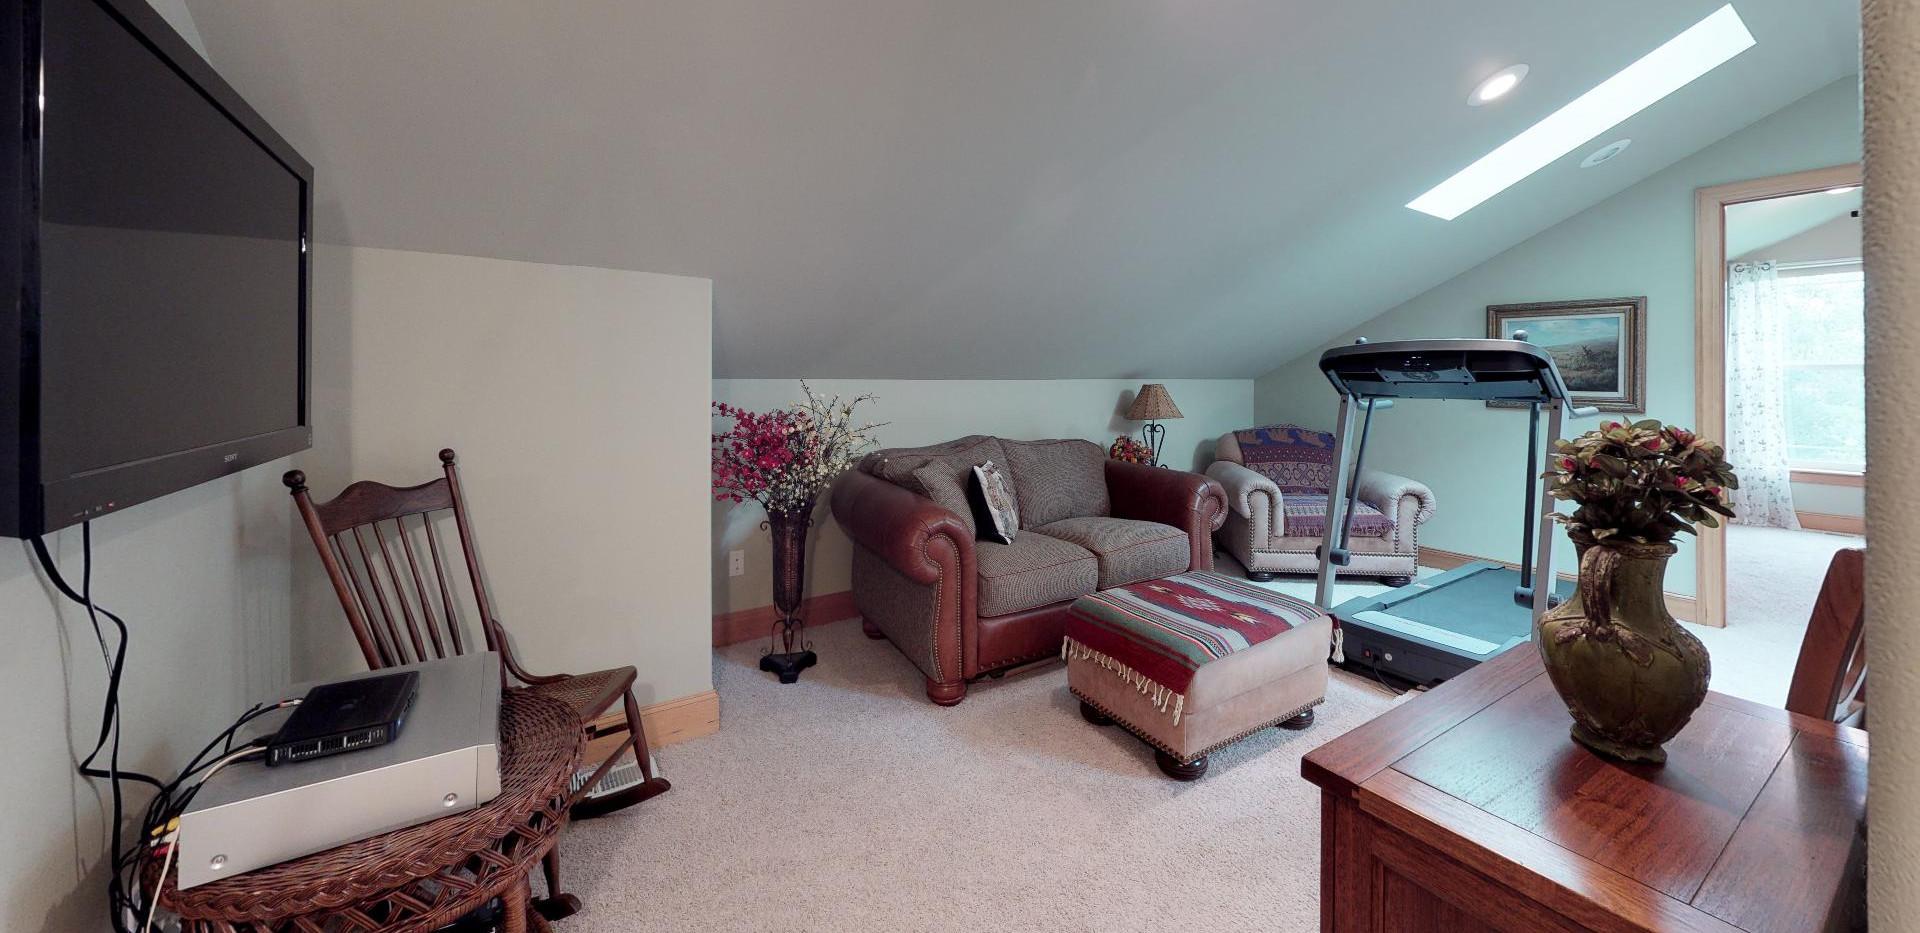 KFr8RyMwd2q - Bedroom(1).jpg